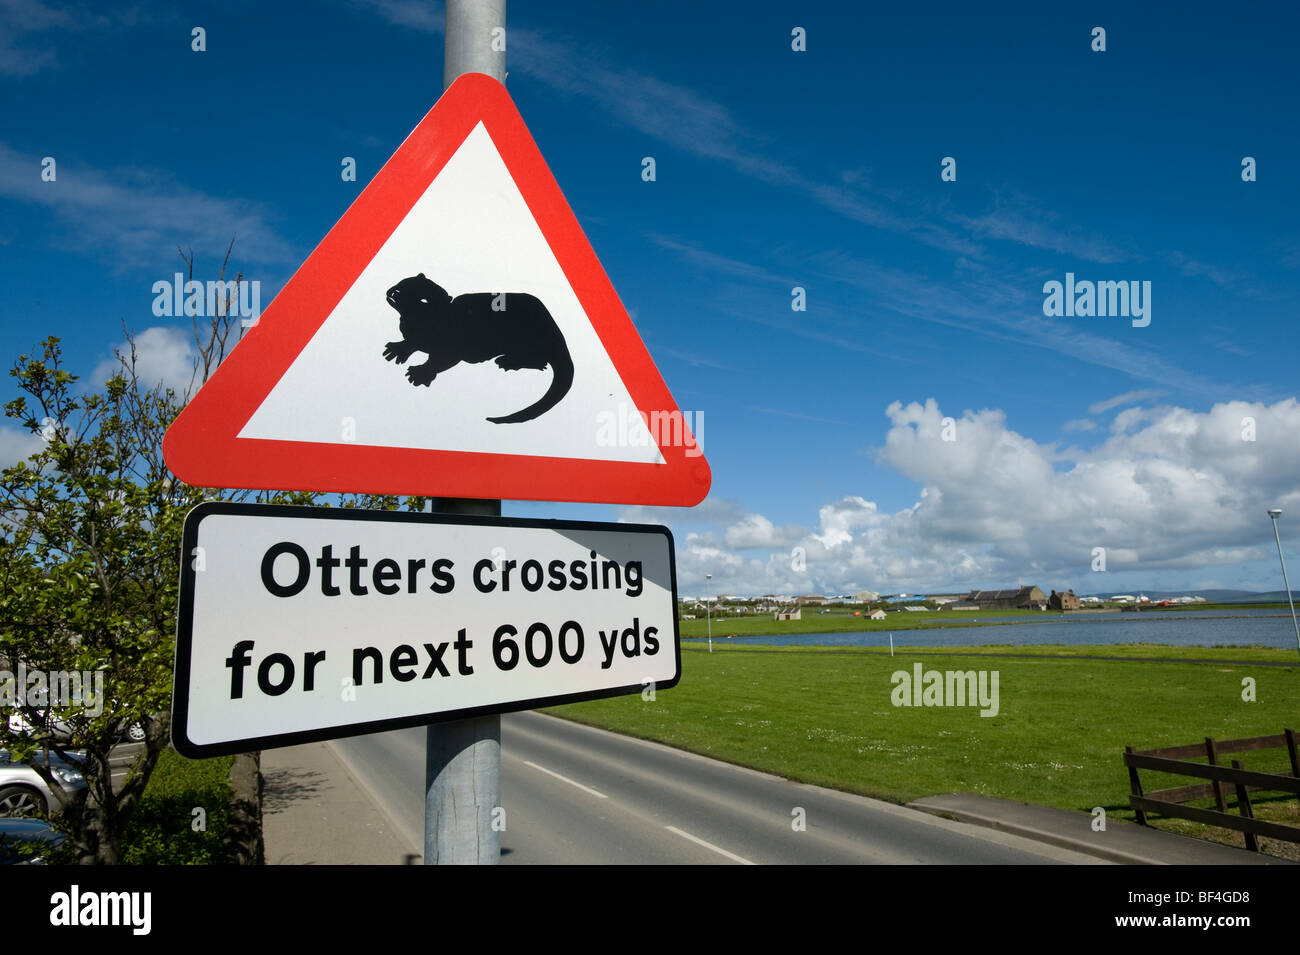 Warning label, 'otters crossing', Kirkwall, Orkney Islands, Scotland, United Kingdom, Europe - Stock Image